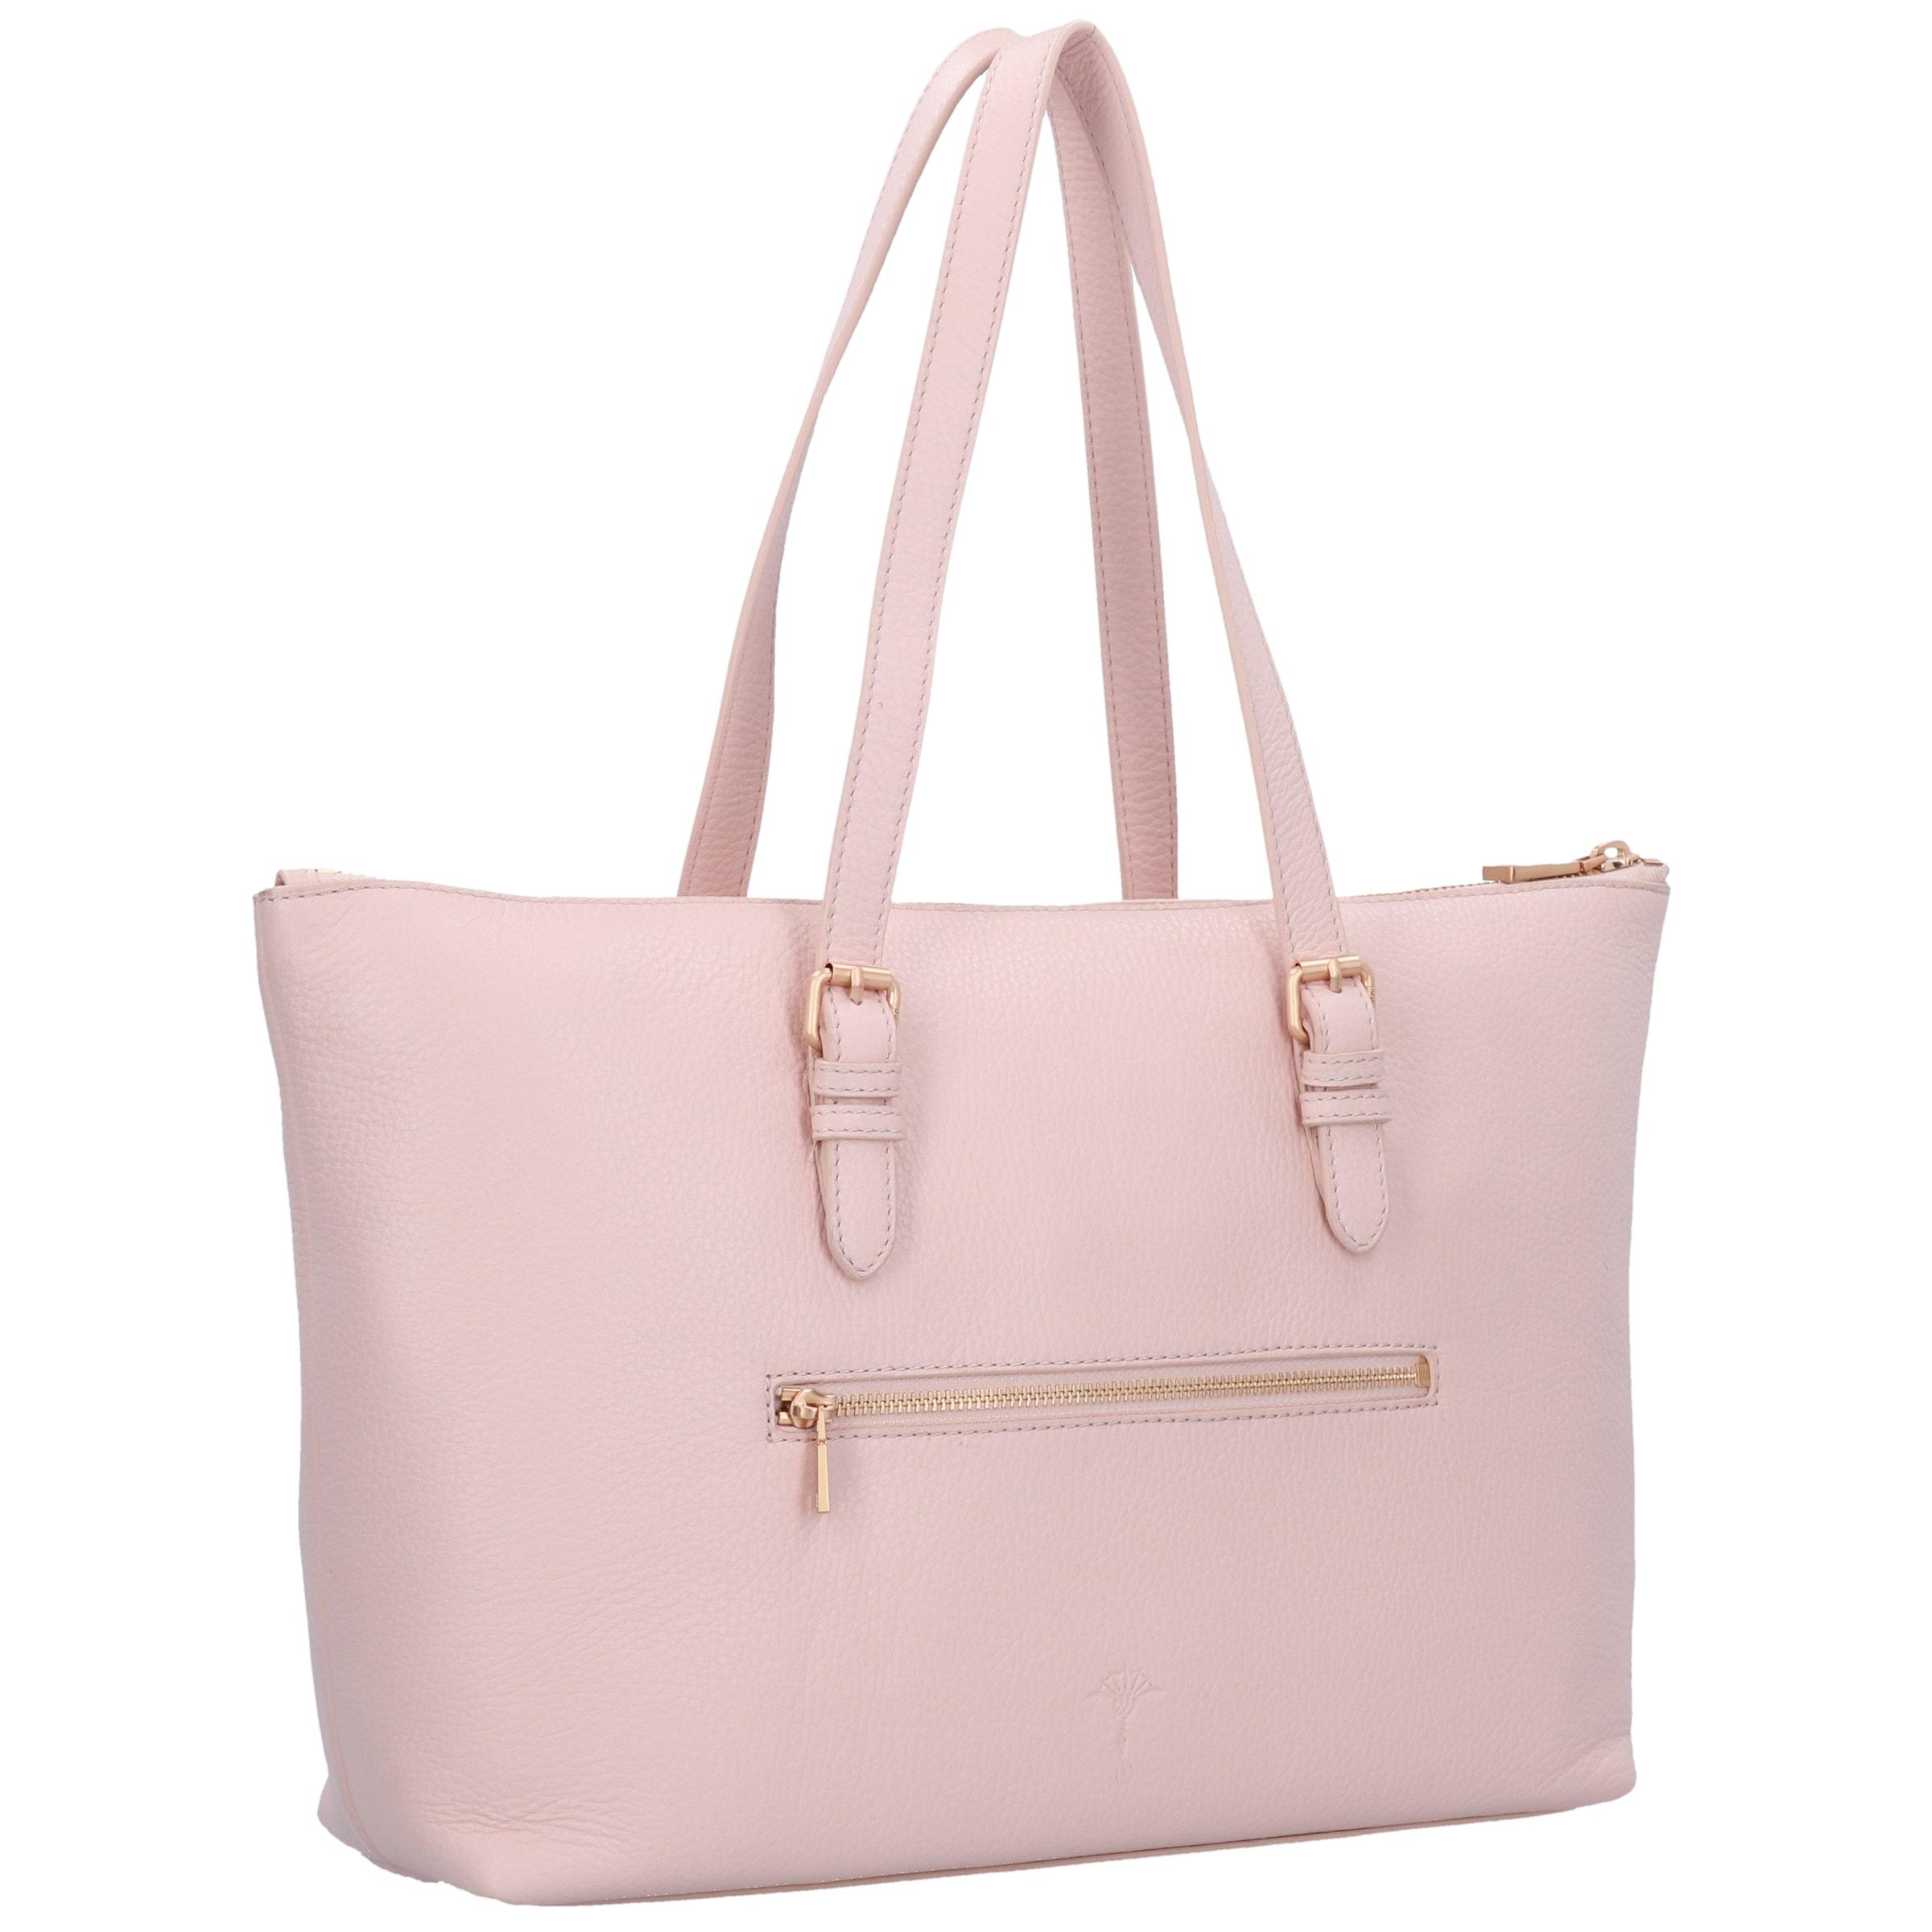 JoopShopper In Pink 'chiara JoopShopper 'chiara Marla' In JoopShopper Marla' Pink TF5u1lK3Jc